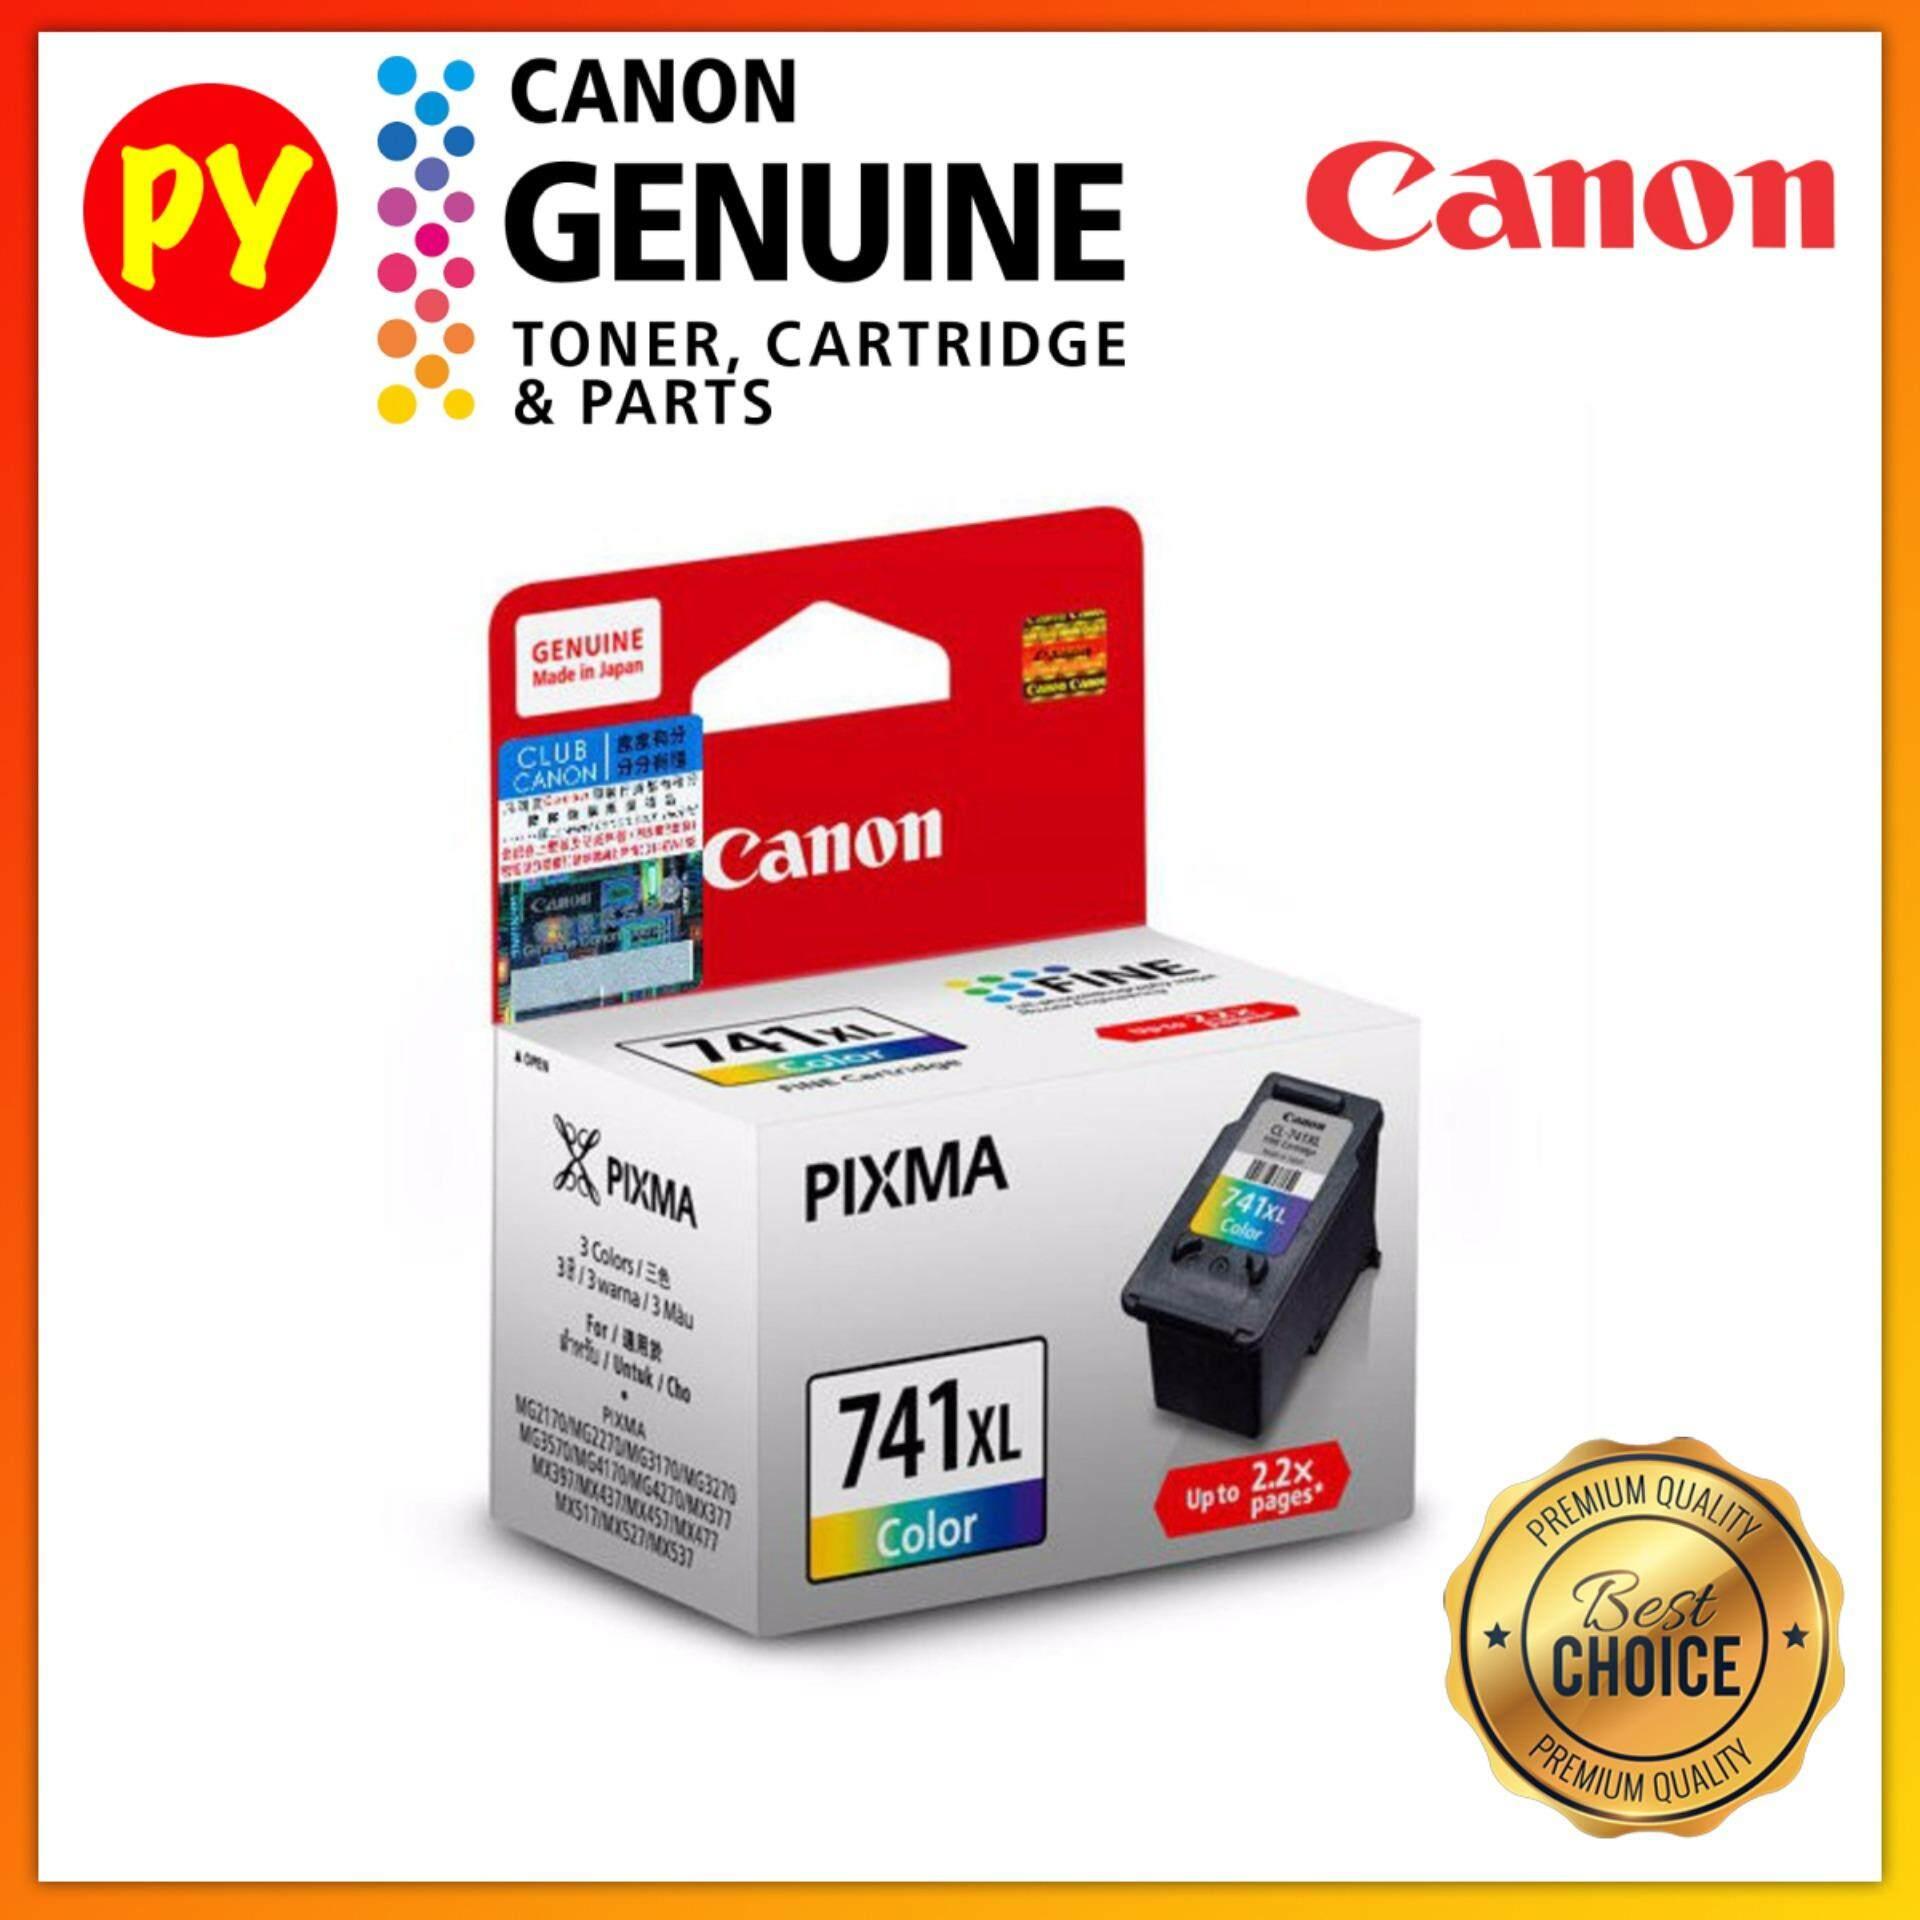 Canon CL-741 XL Color Original Ink Cartridge - For Canon Pixma MG2170/2270/3170/3570/4170/4270, MX377/397/437/457/477/517/527/537 printers